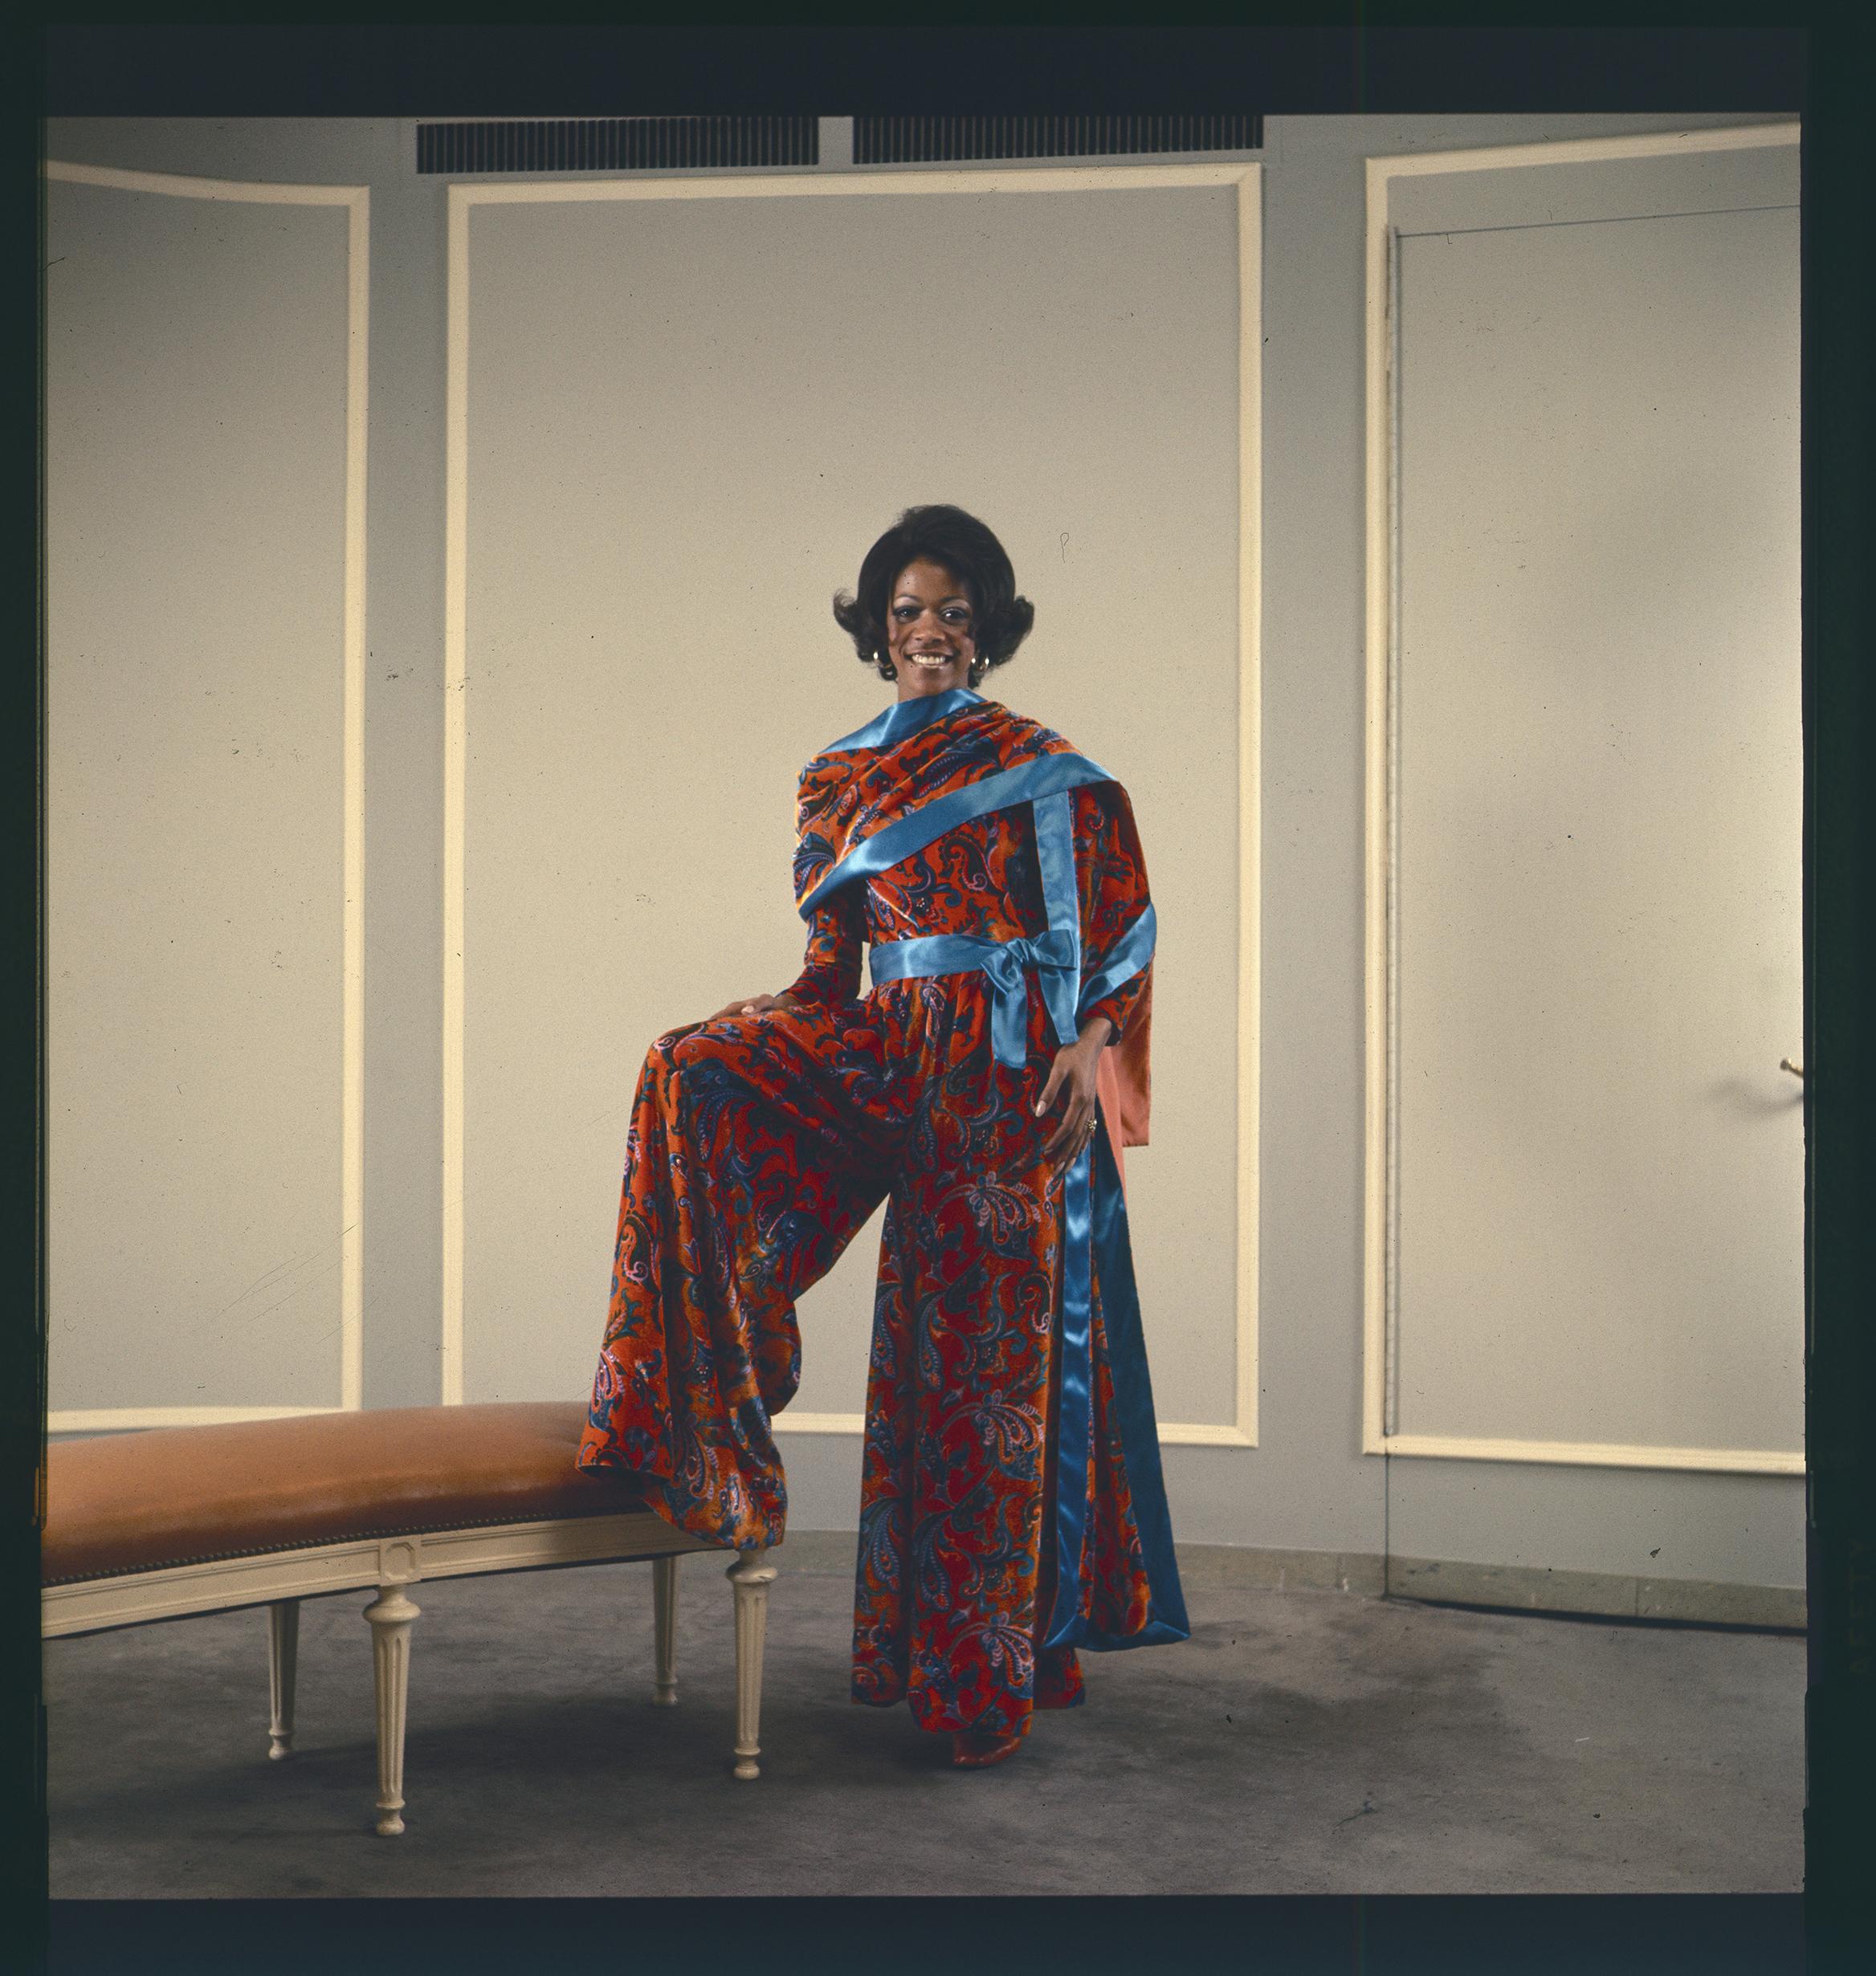 Gates to the Archives: Theaster Opens Up Black History at Fondazione Prada  | Fondazione Prada Osservatorio | Sotheby's